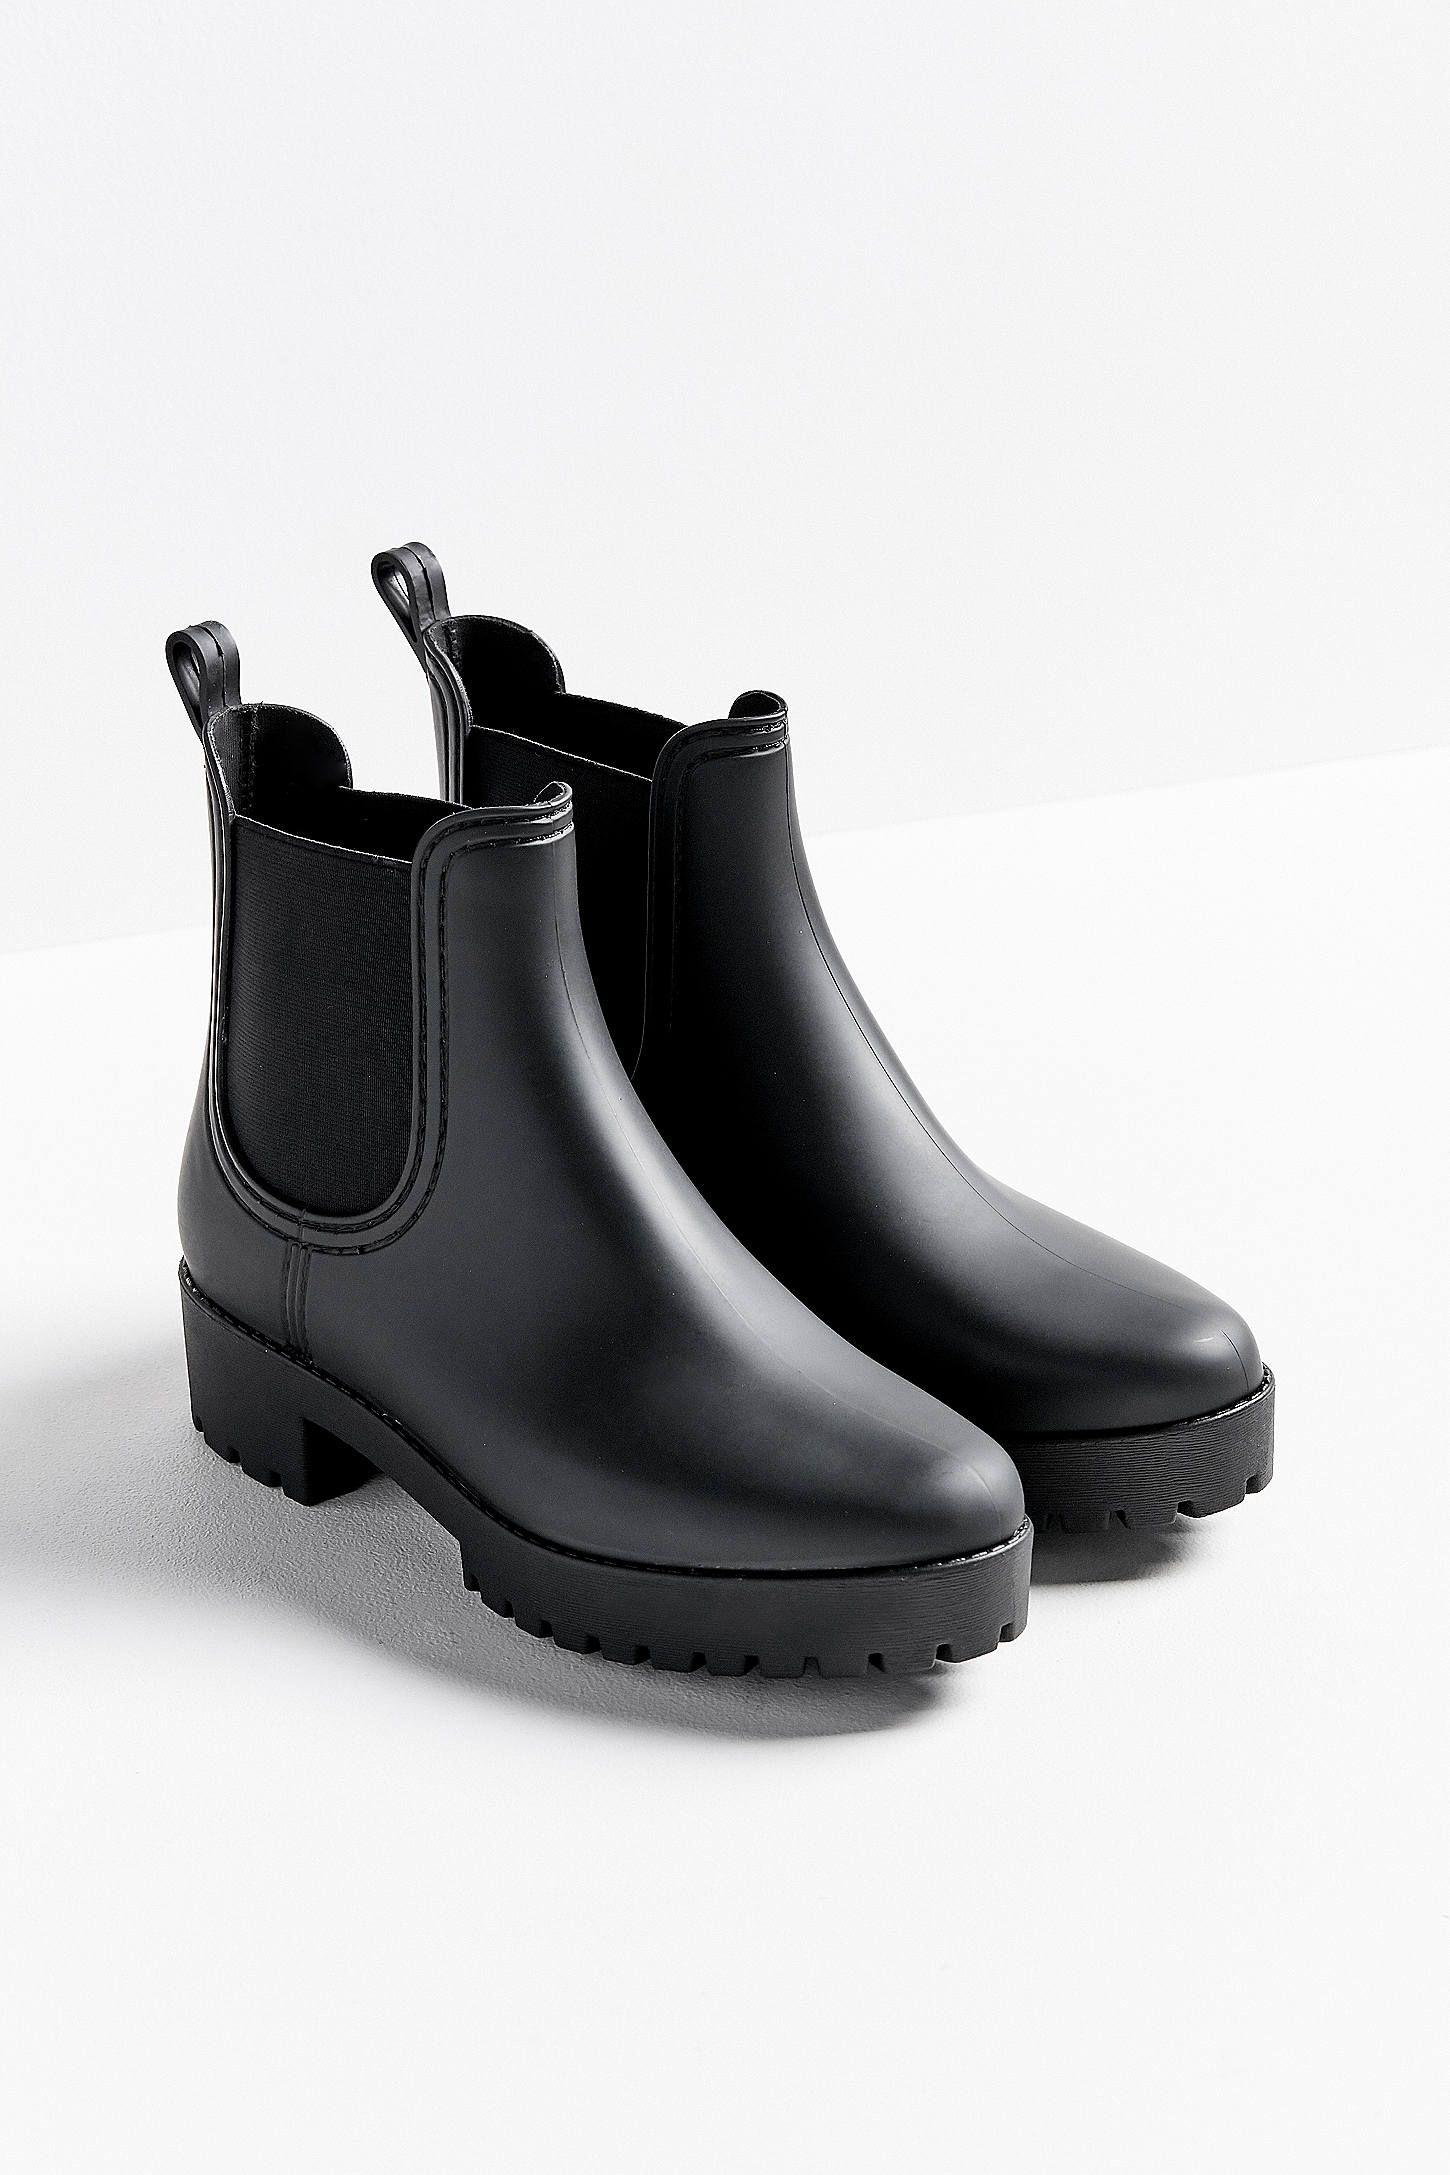 66942d9ed Jeffrey Campbell Cloudy Rain Boot